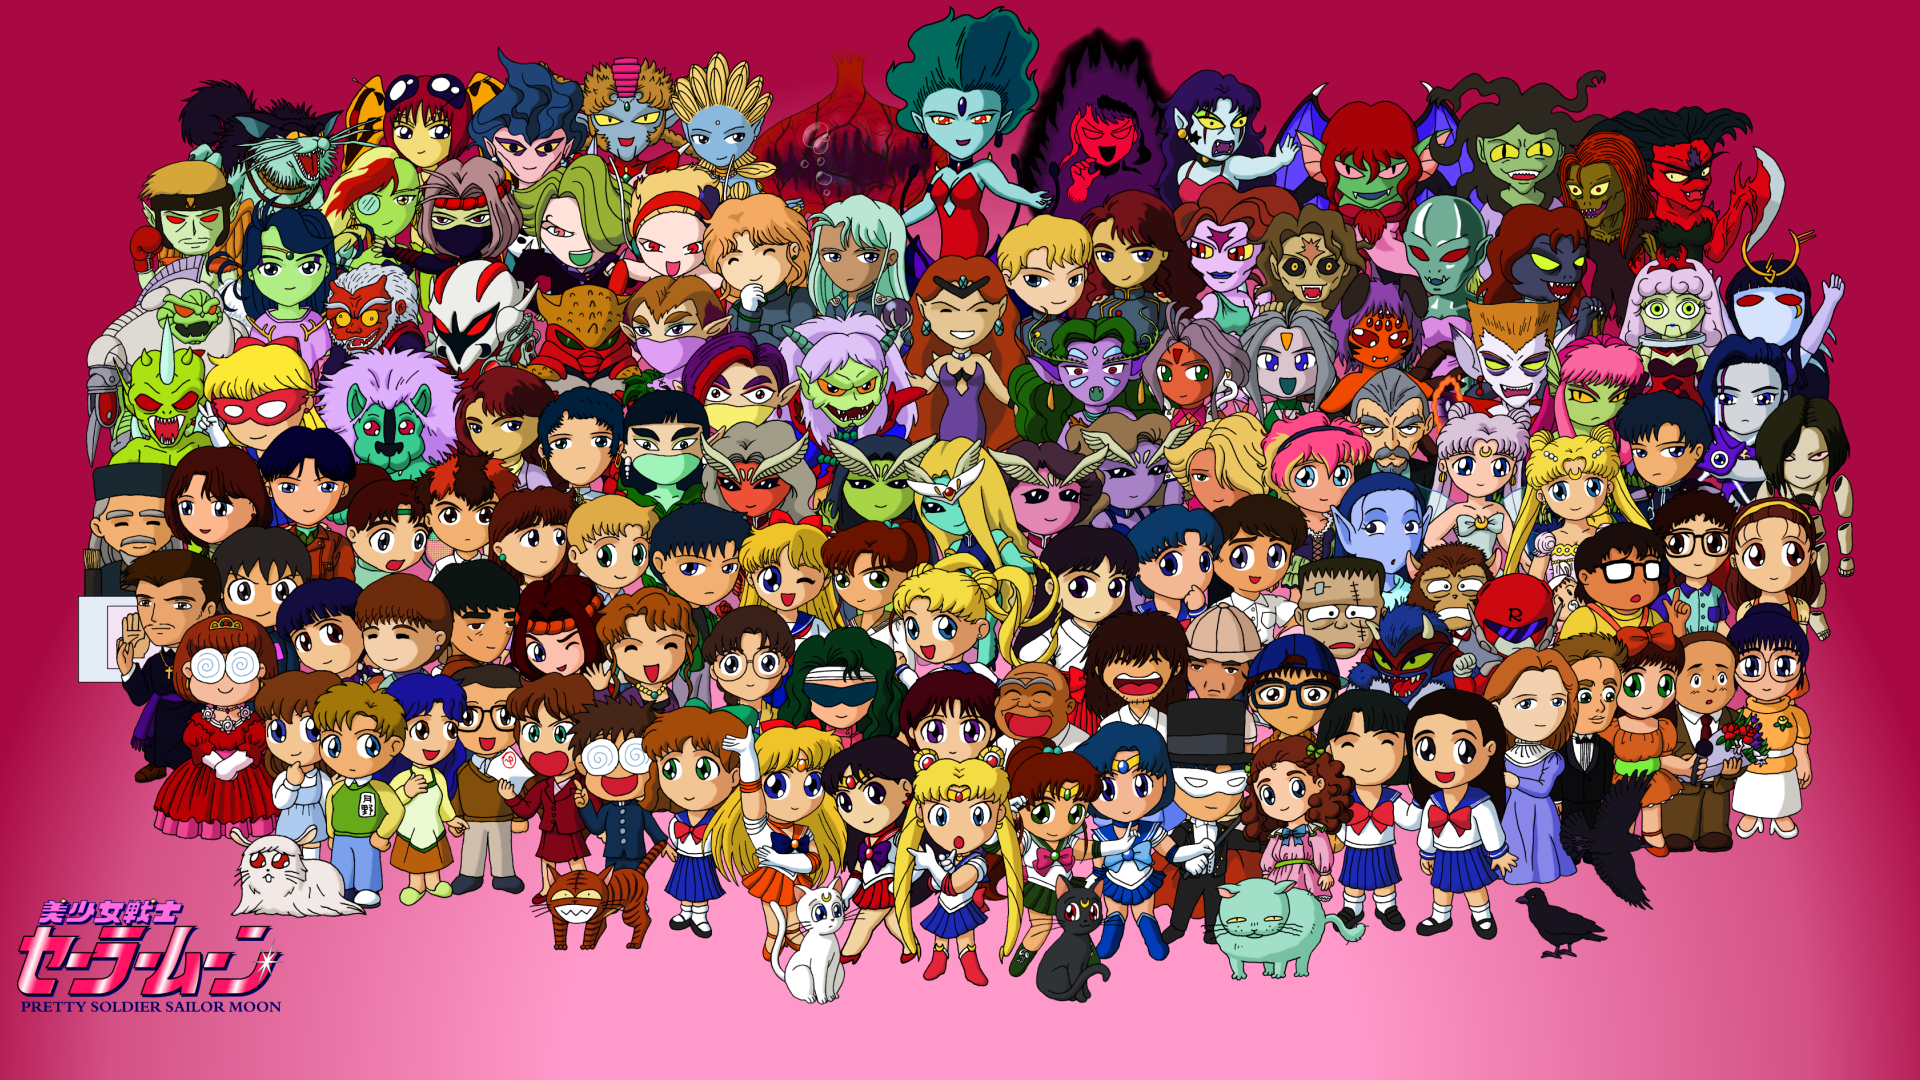 Sailor Moon Season 1 Wallpaper by TinySailorMoon